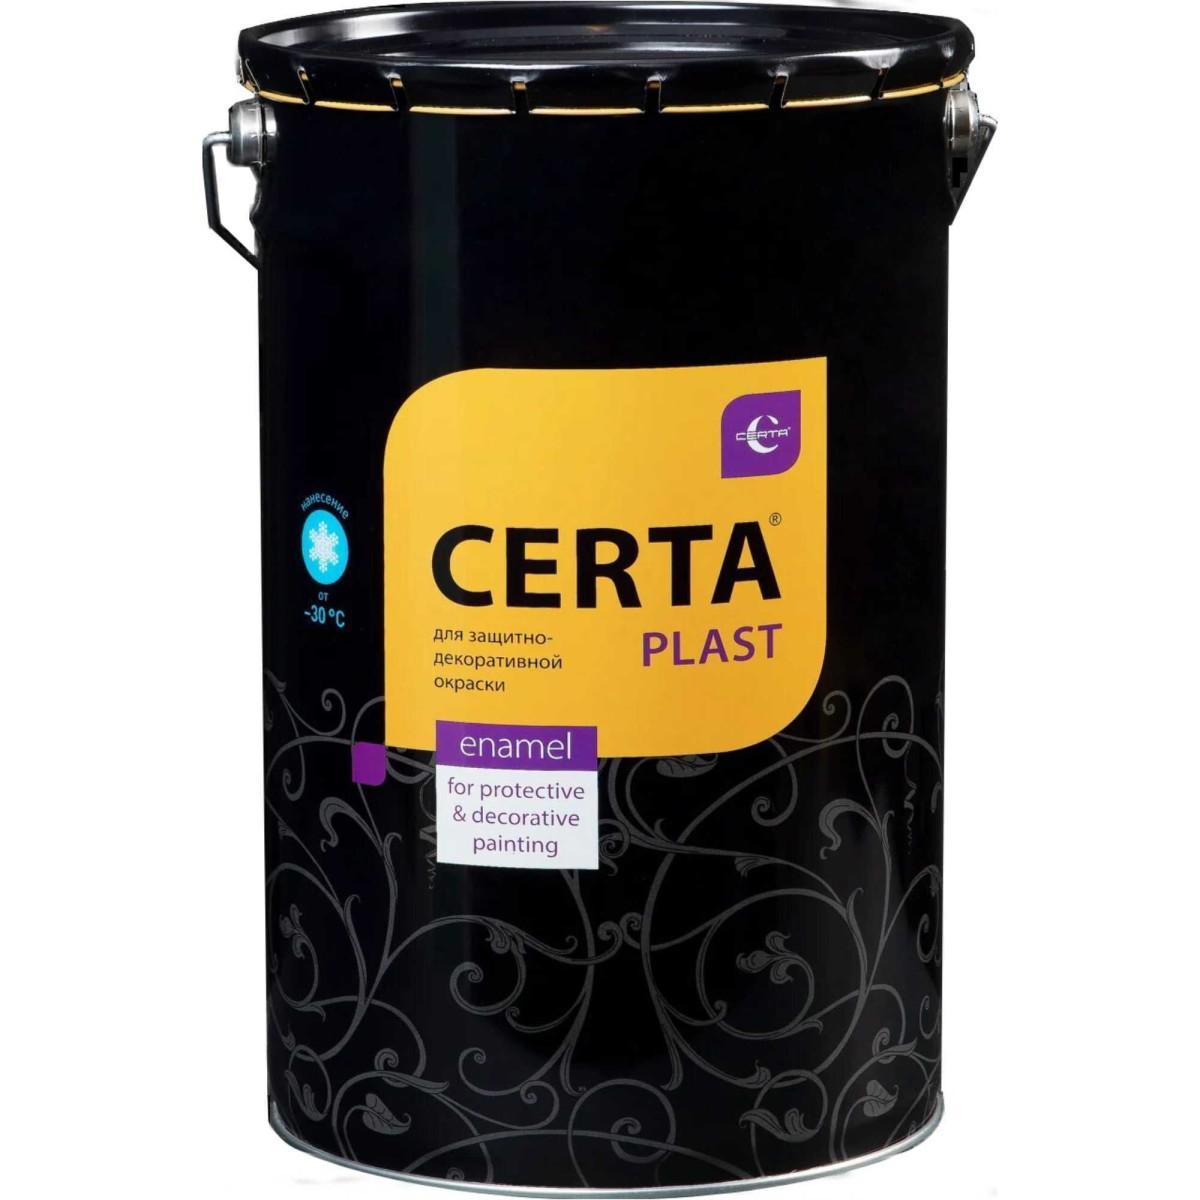 Эмаль Certa Plast полуглянцевая цвет жёлтый 20 л